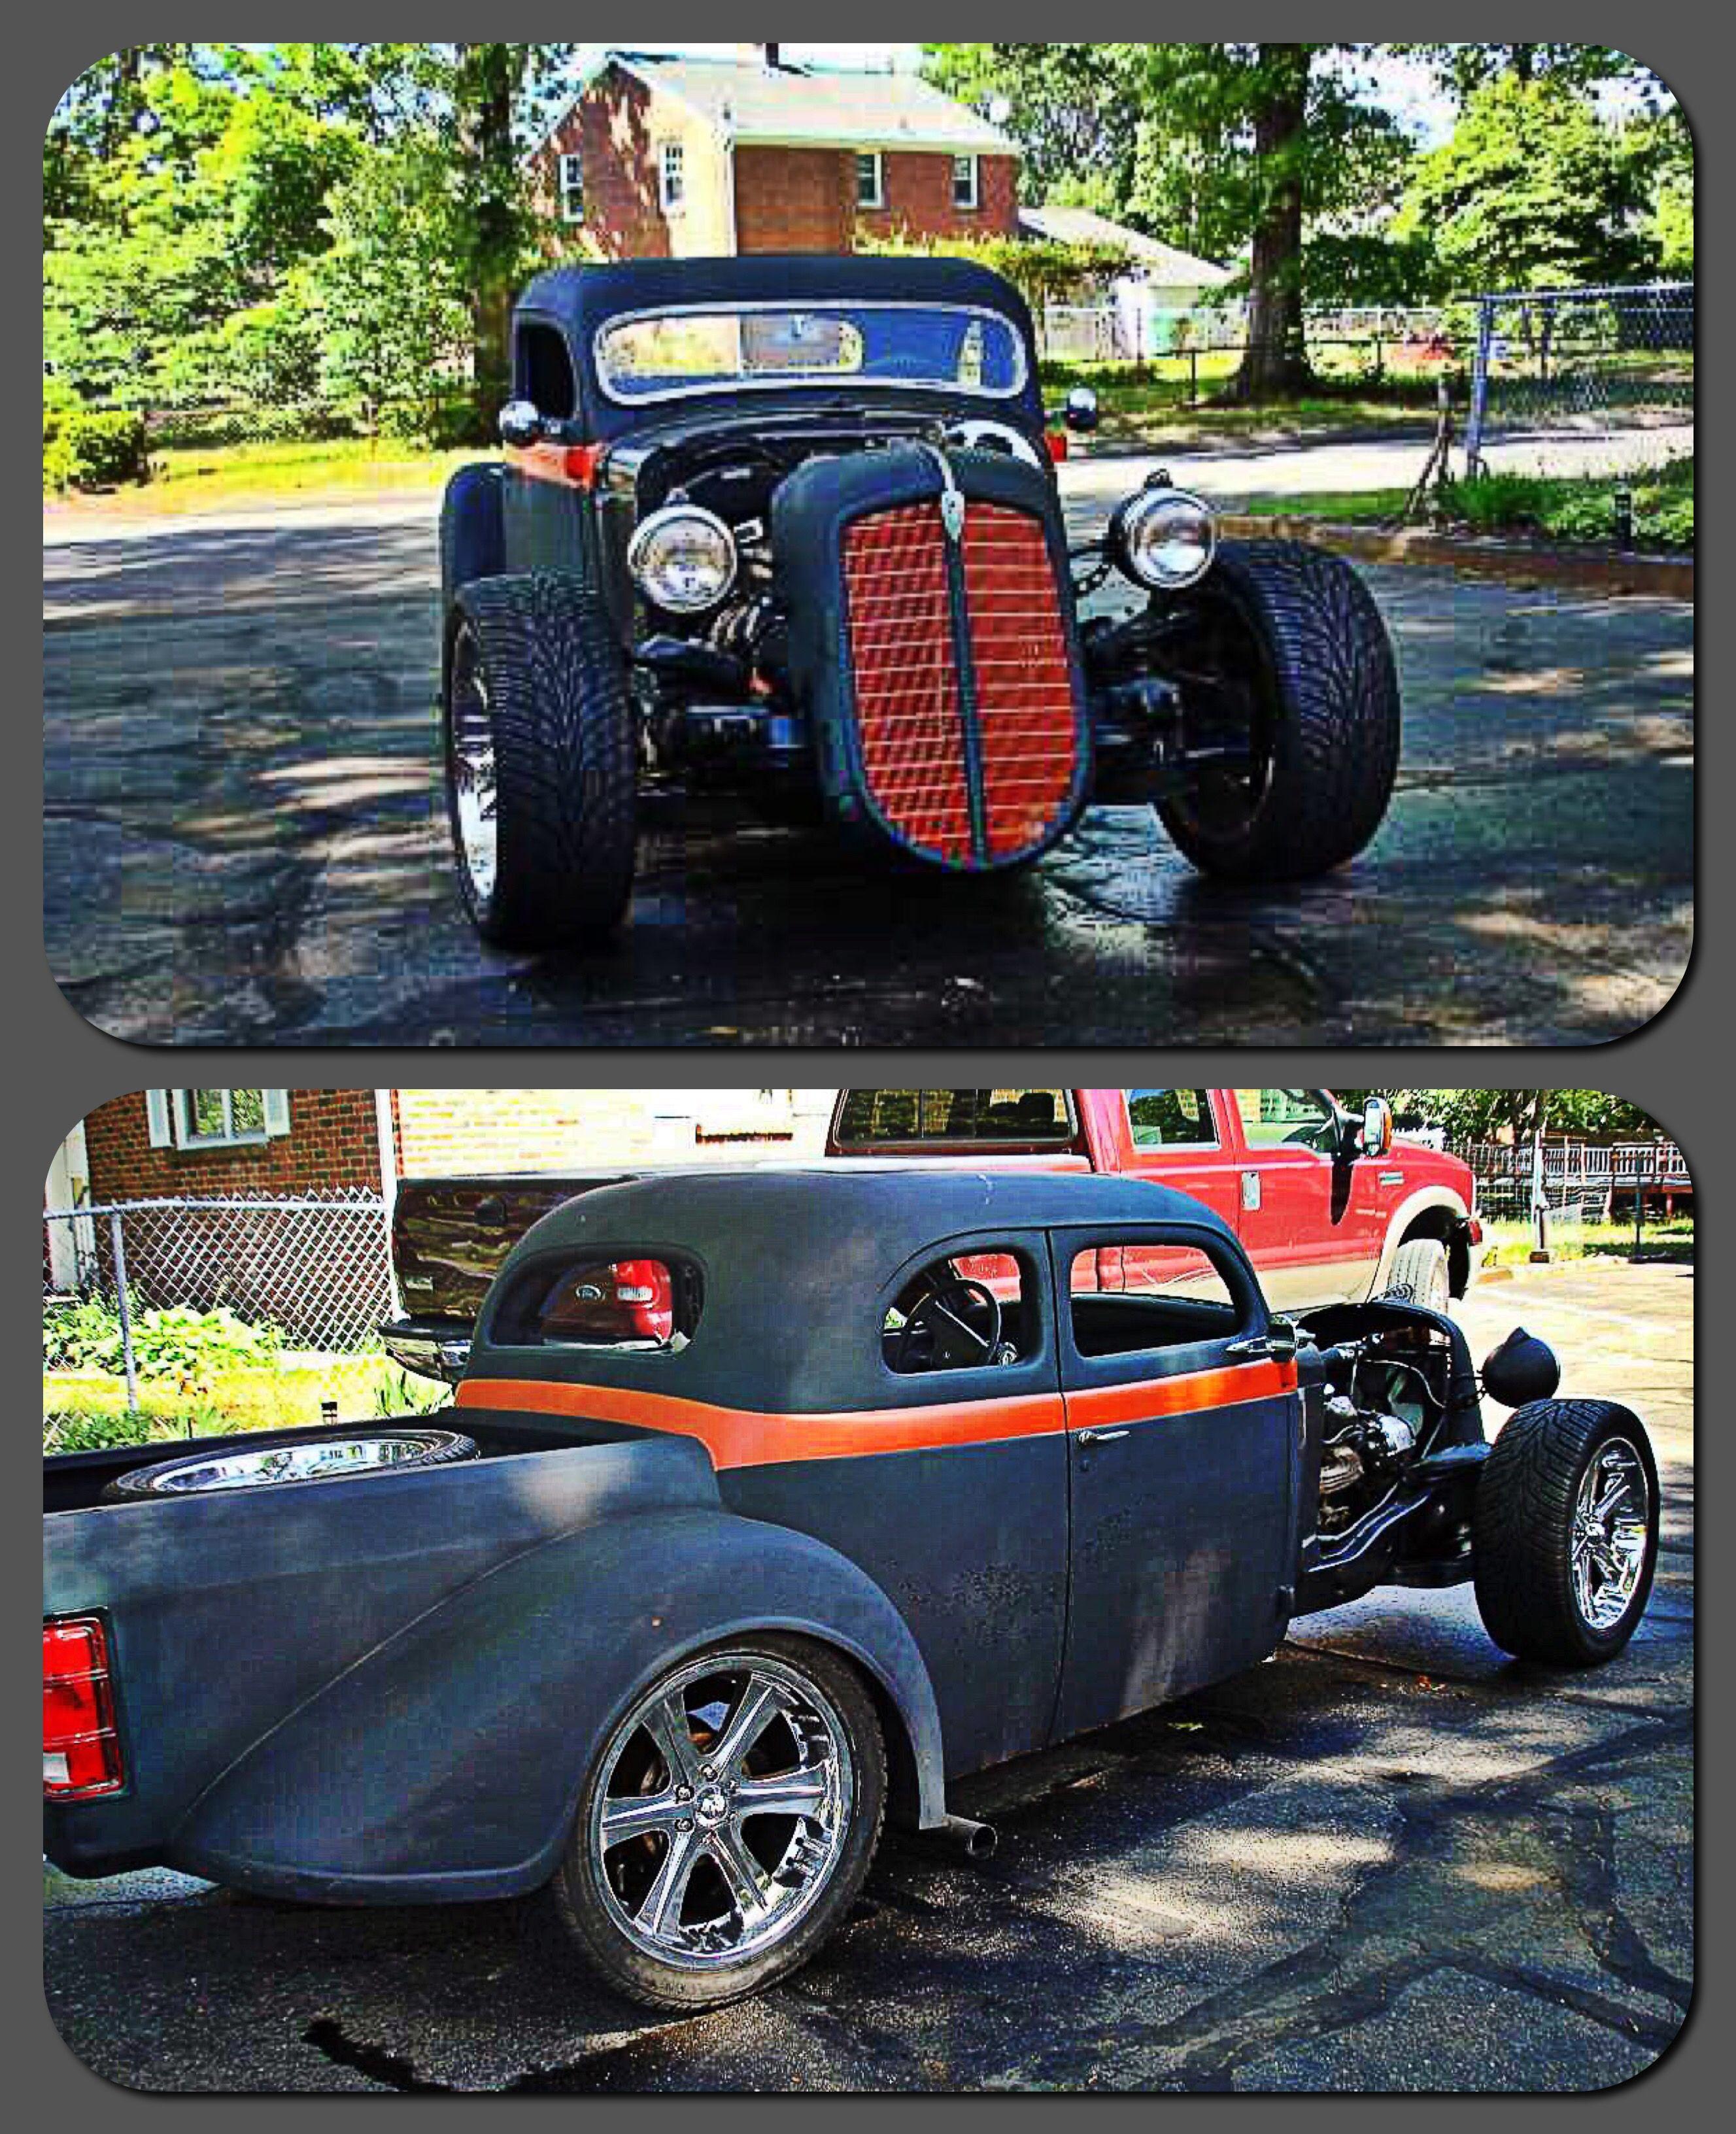 35 Plymouth Hot Rod Craigslist Albany Ny Hot Cars Monster Trucks Toy Car